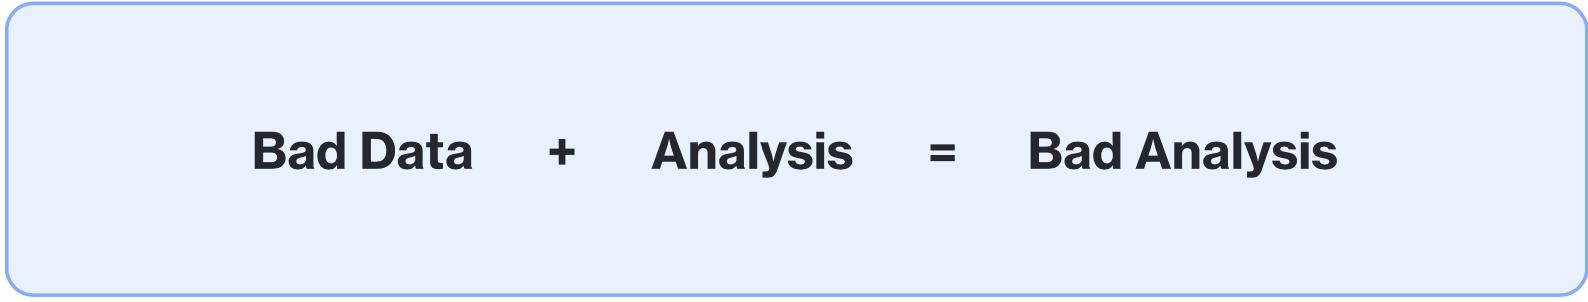 Data_Problem_Formula